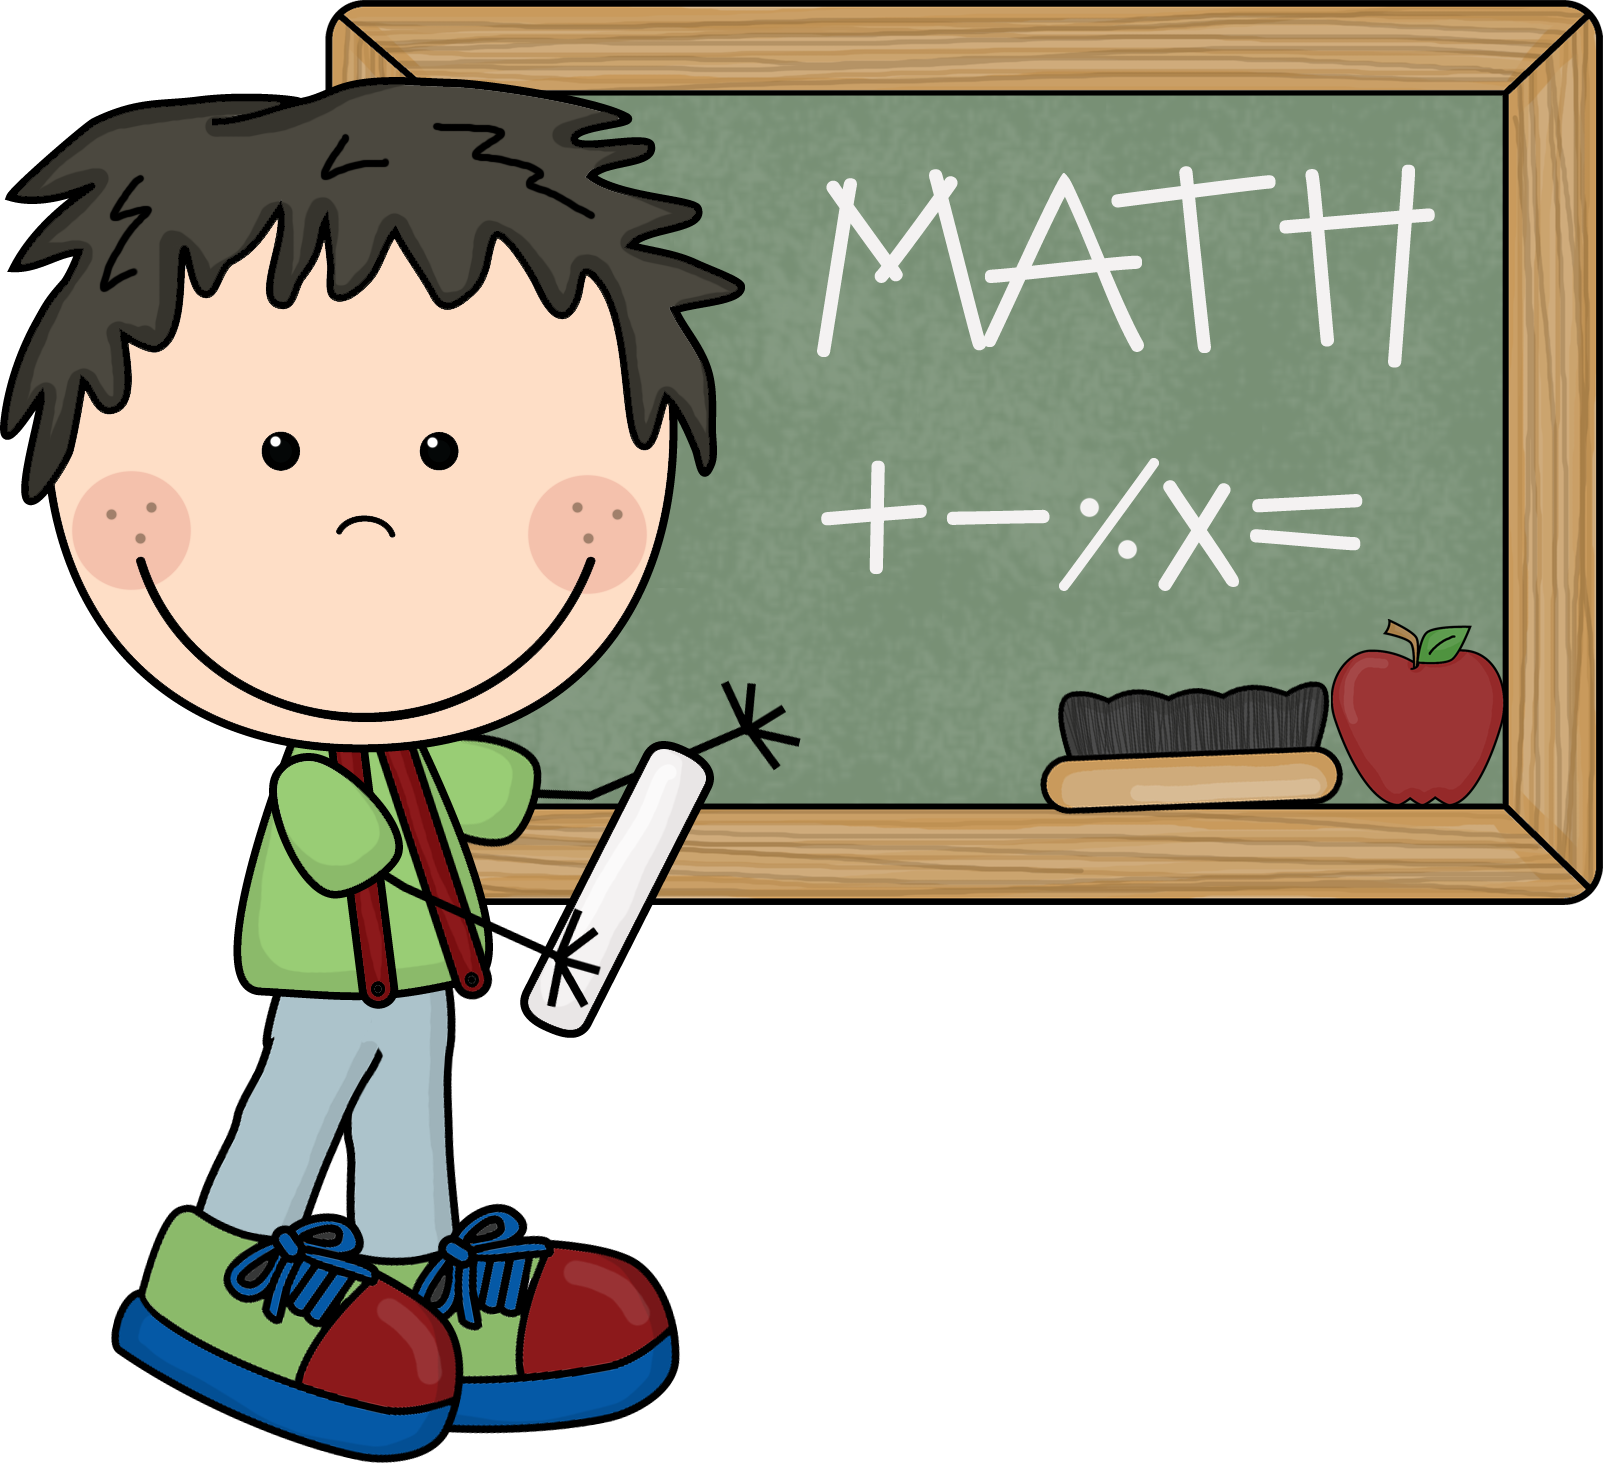 Clipart school clinic vector LovesMath_6.png (1603×1464) | Imprimibles | Pinterest | Clip art ... vector